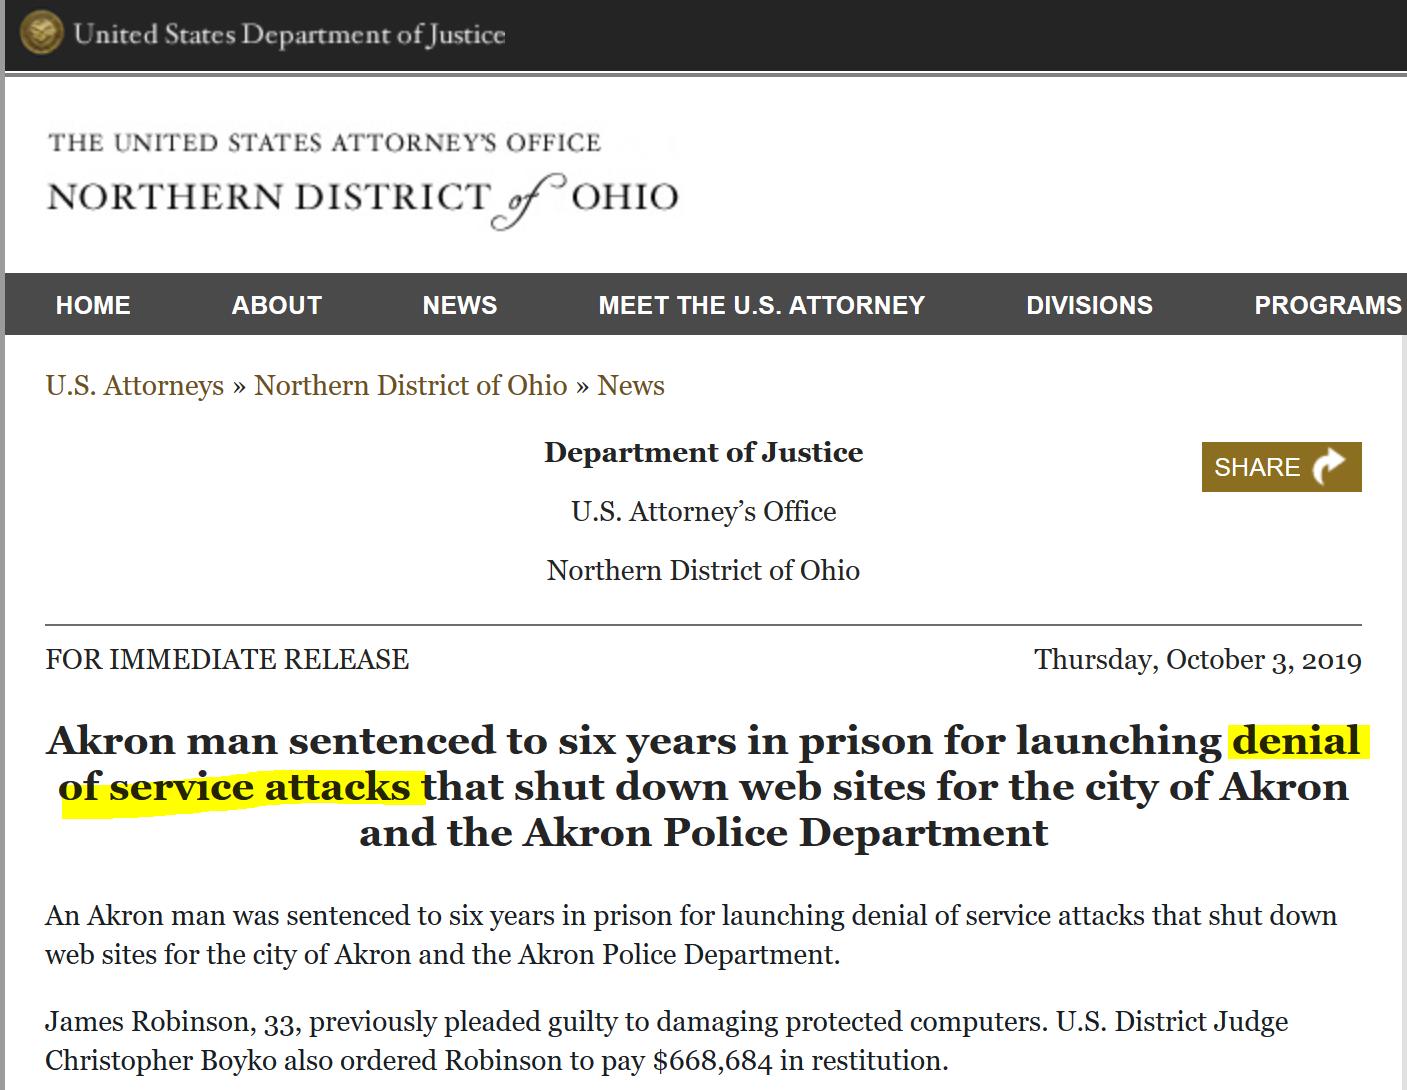 DDoS attacker receives 6 year prison term